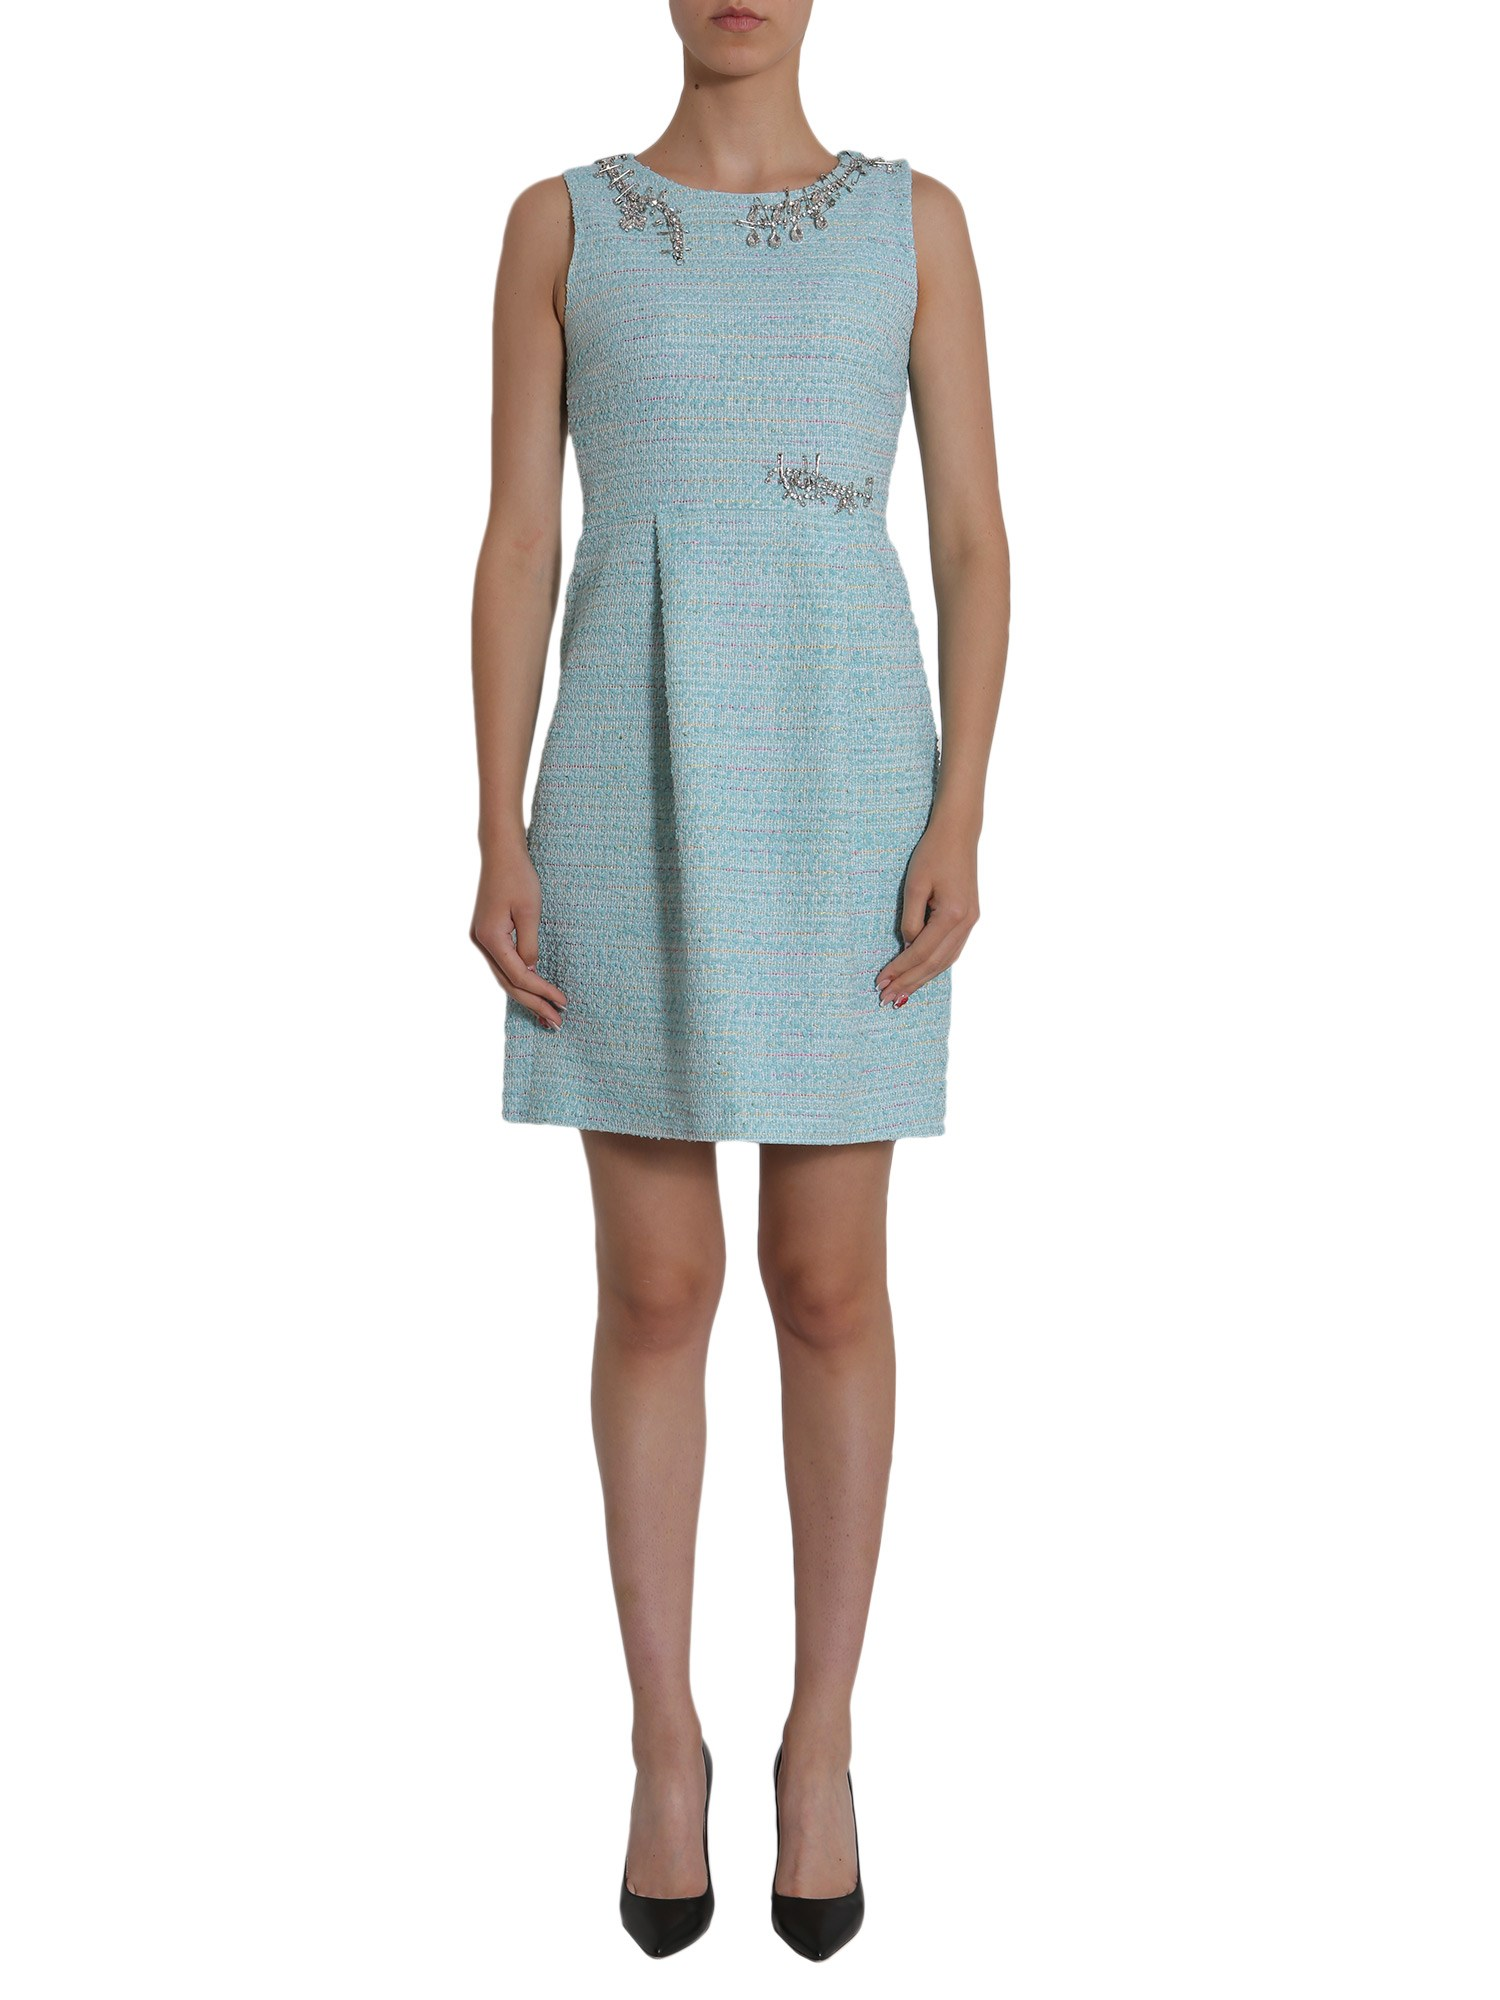 Boutique moschino tweed dress - boutique moschino - Modalova